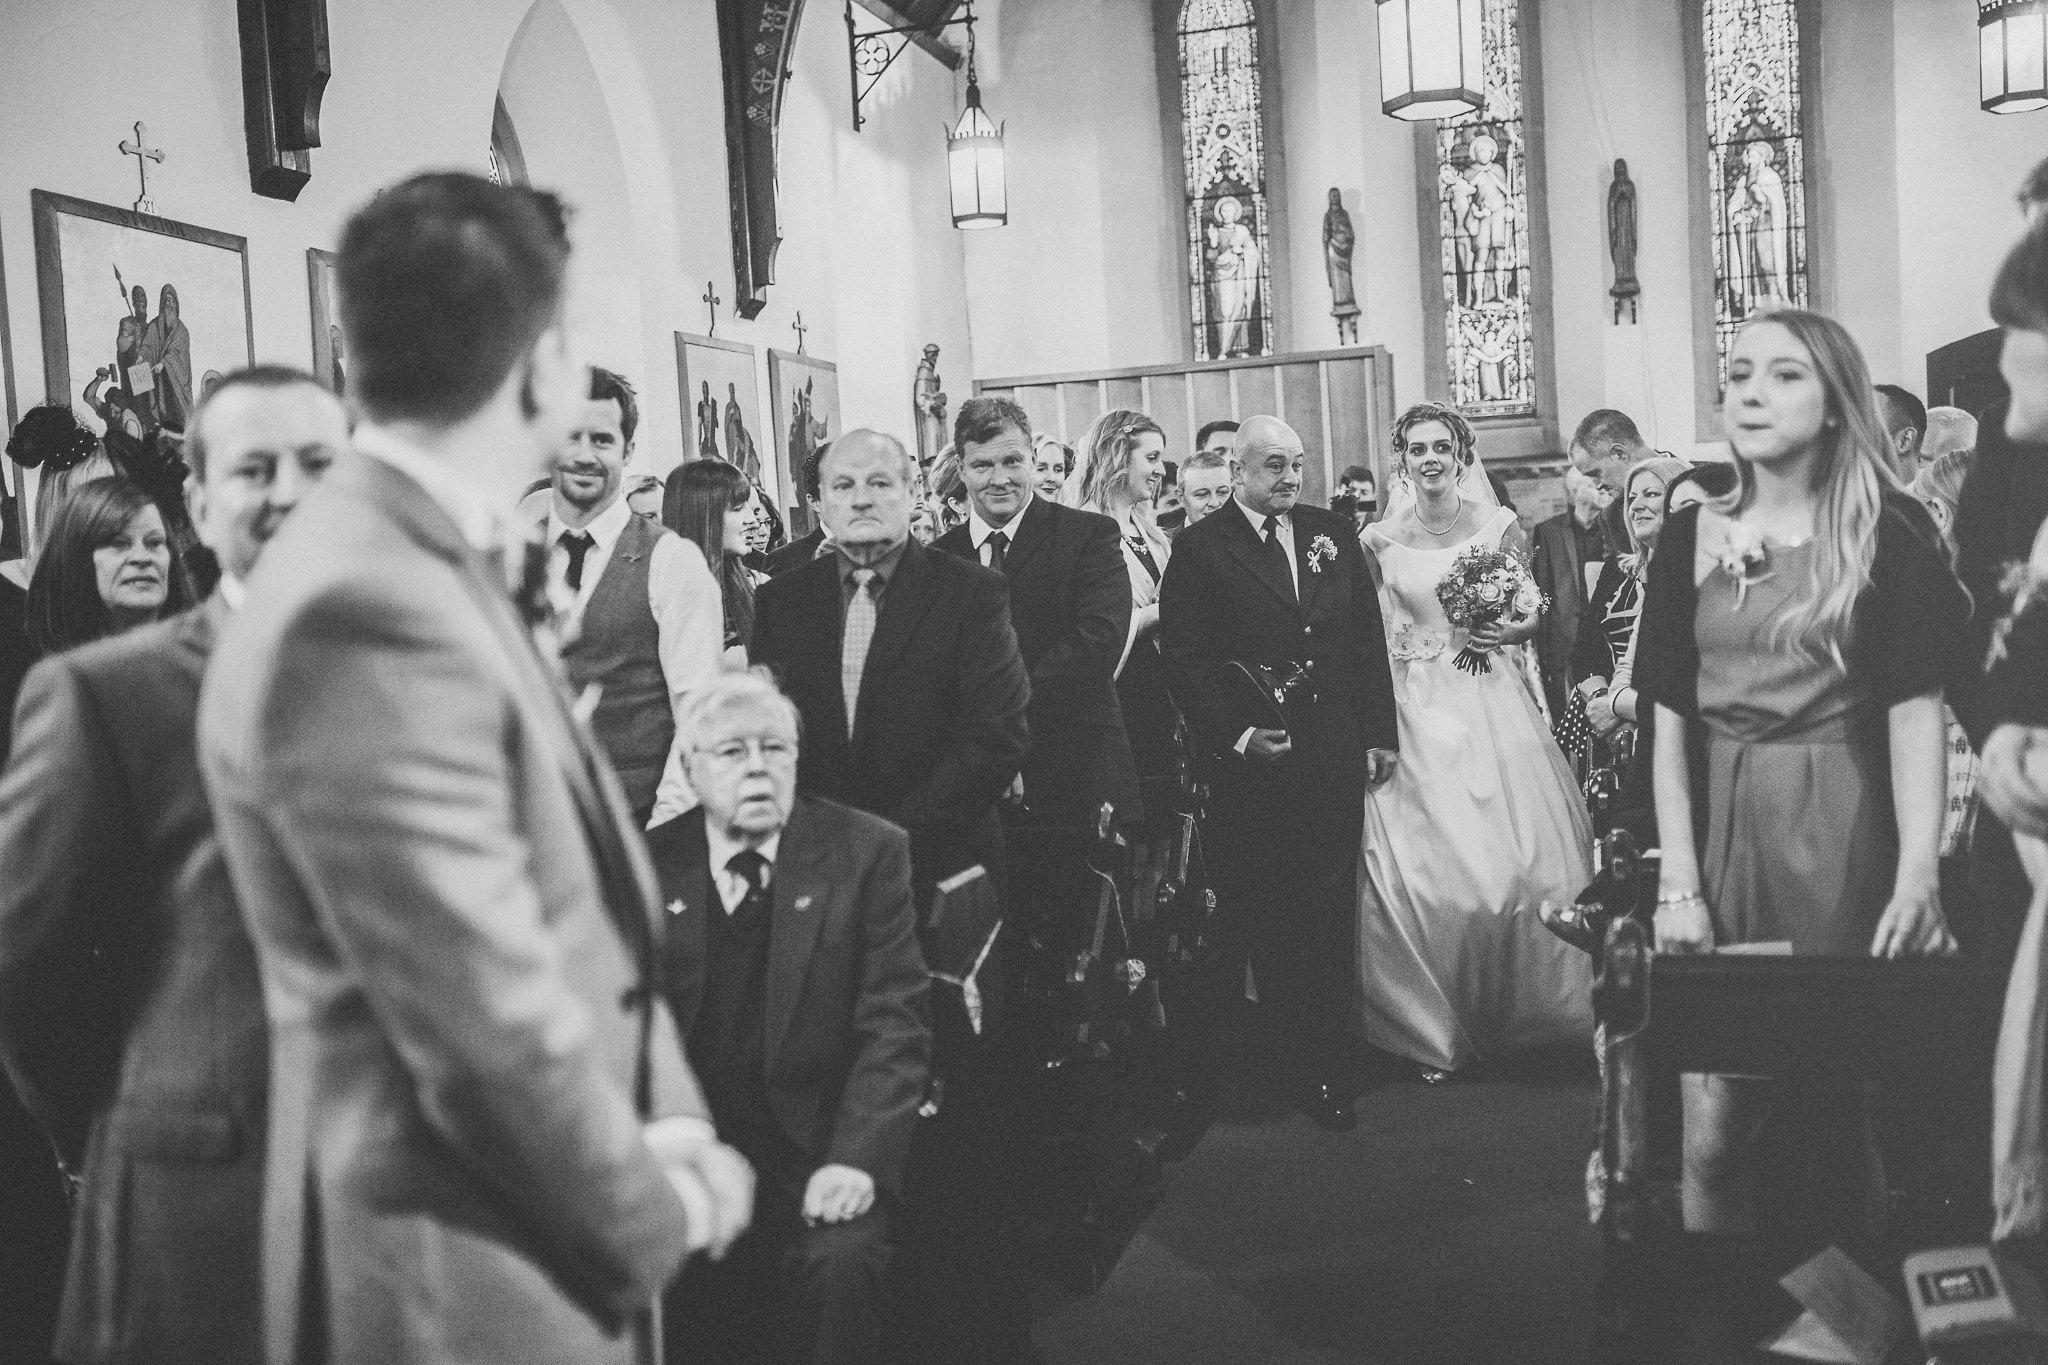 Lancashire-Creative-natural-documentary-wedding-photography-90027